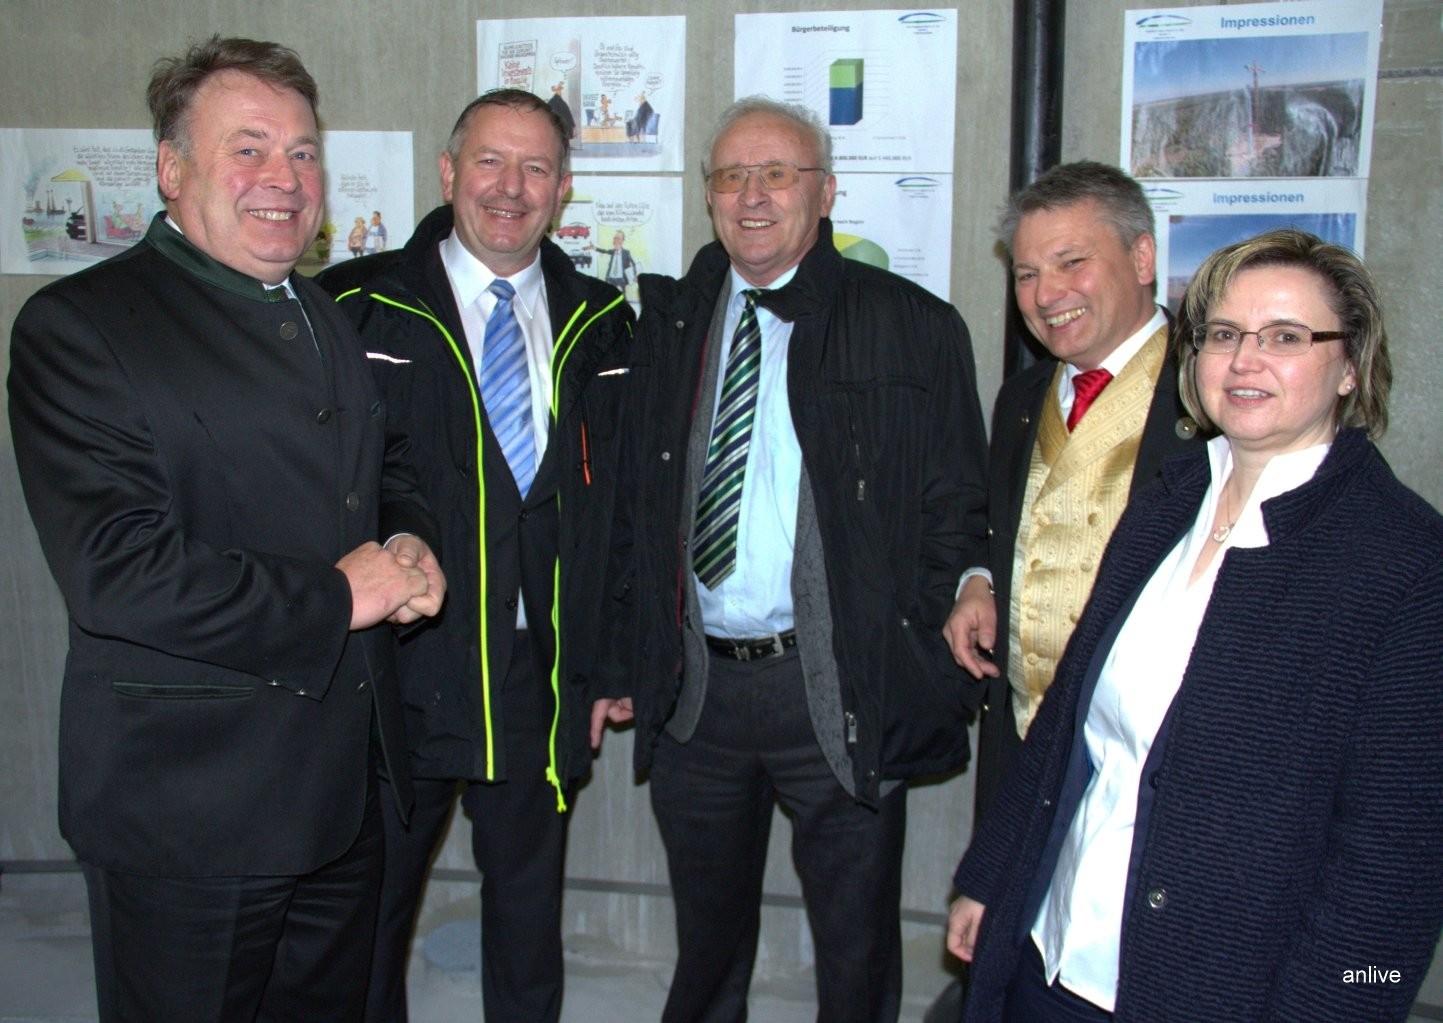 Helmut Brunner, Reinhold Zeilinger, Jürgen Ströbel, Hans Henninger, Renate Hans